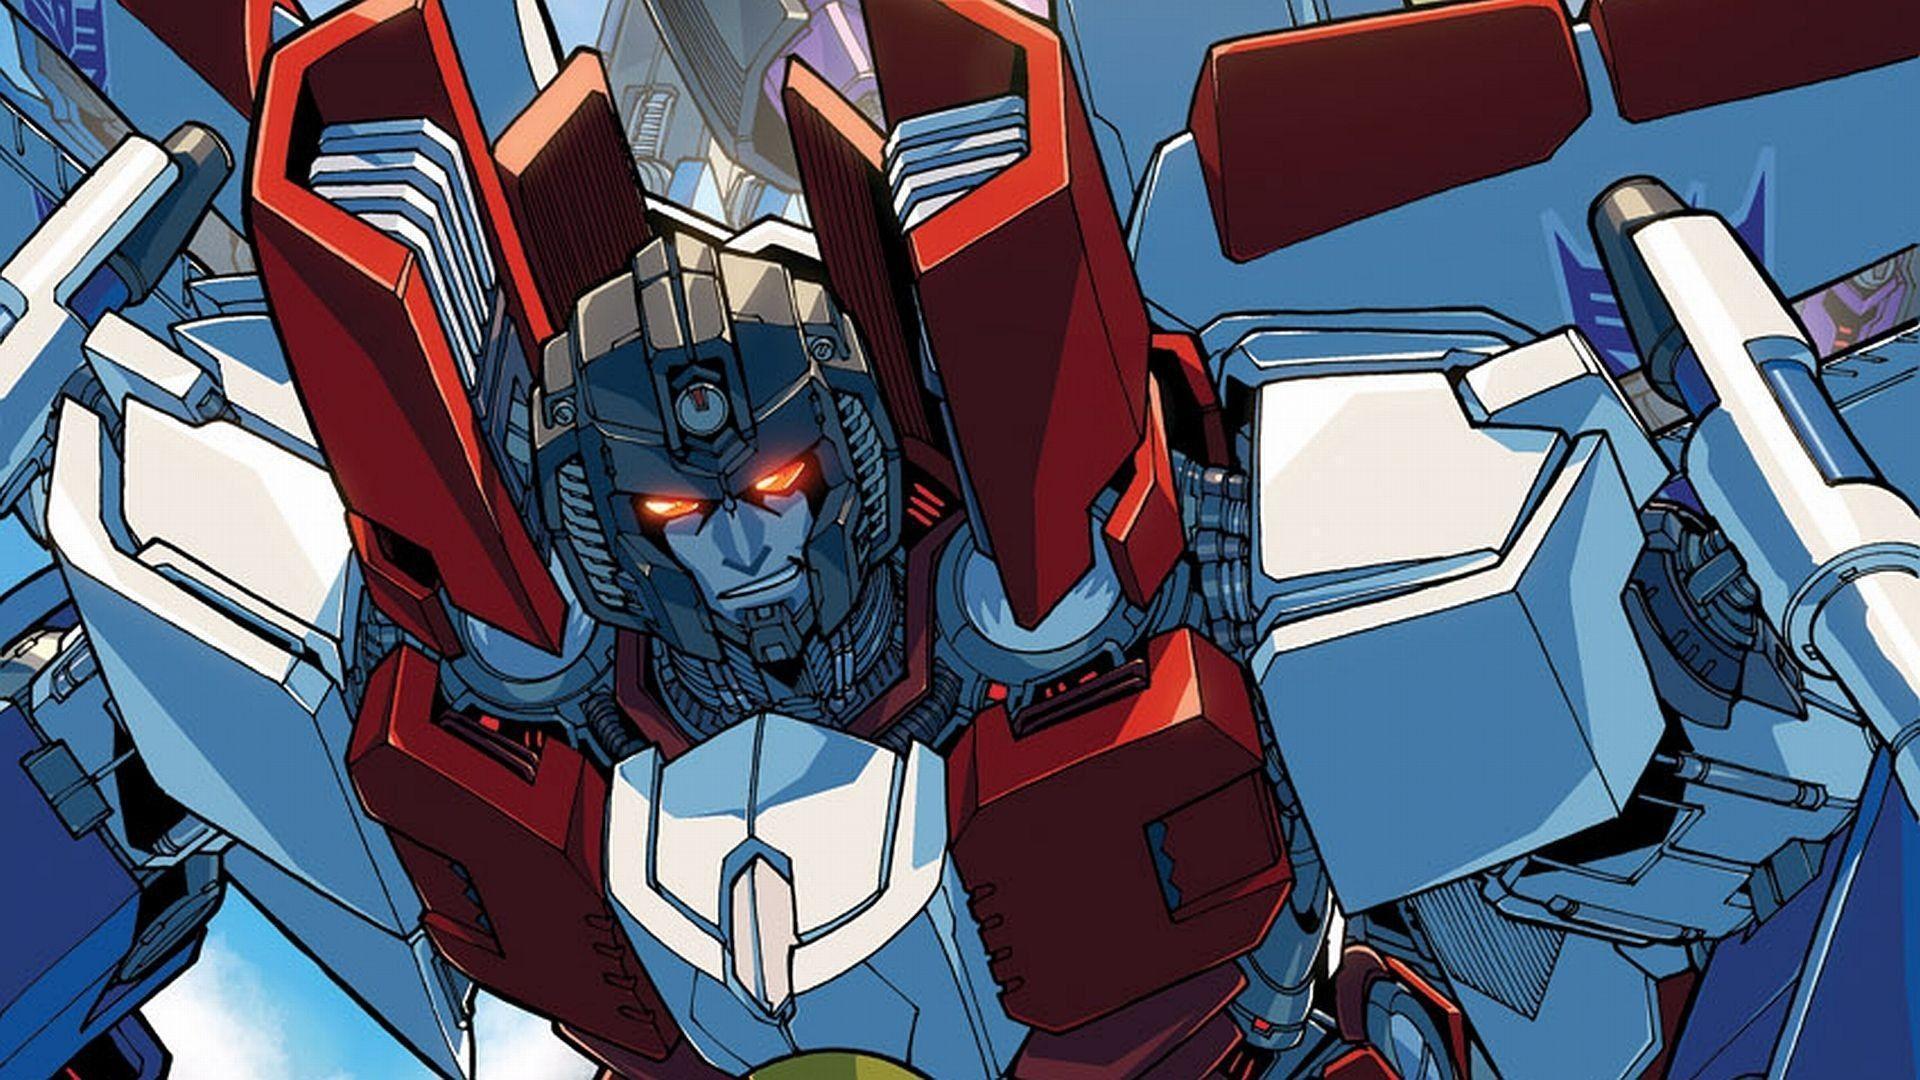 Transformers Fall Of Cybertron Wallpaper 1920x1080 Starscream Wallpapers Wallpaper Cave